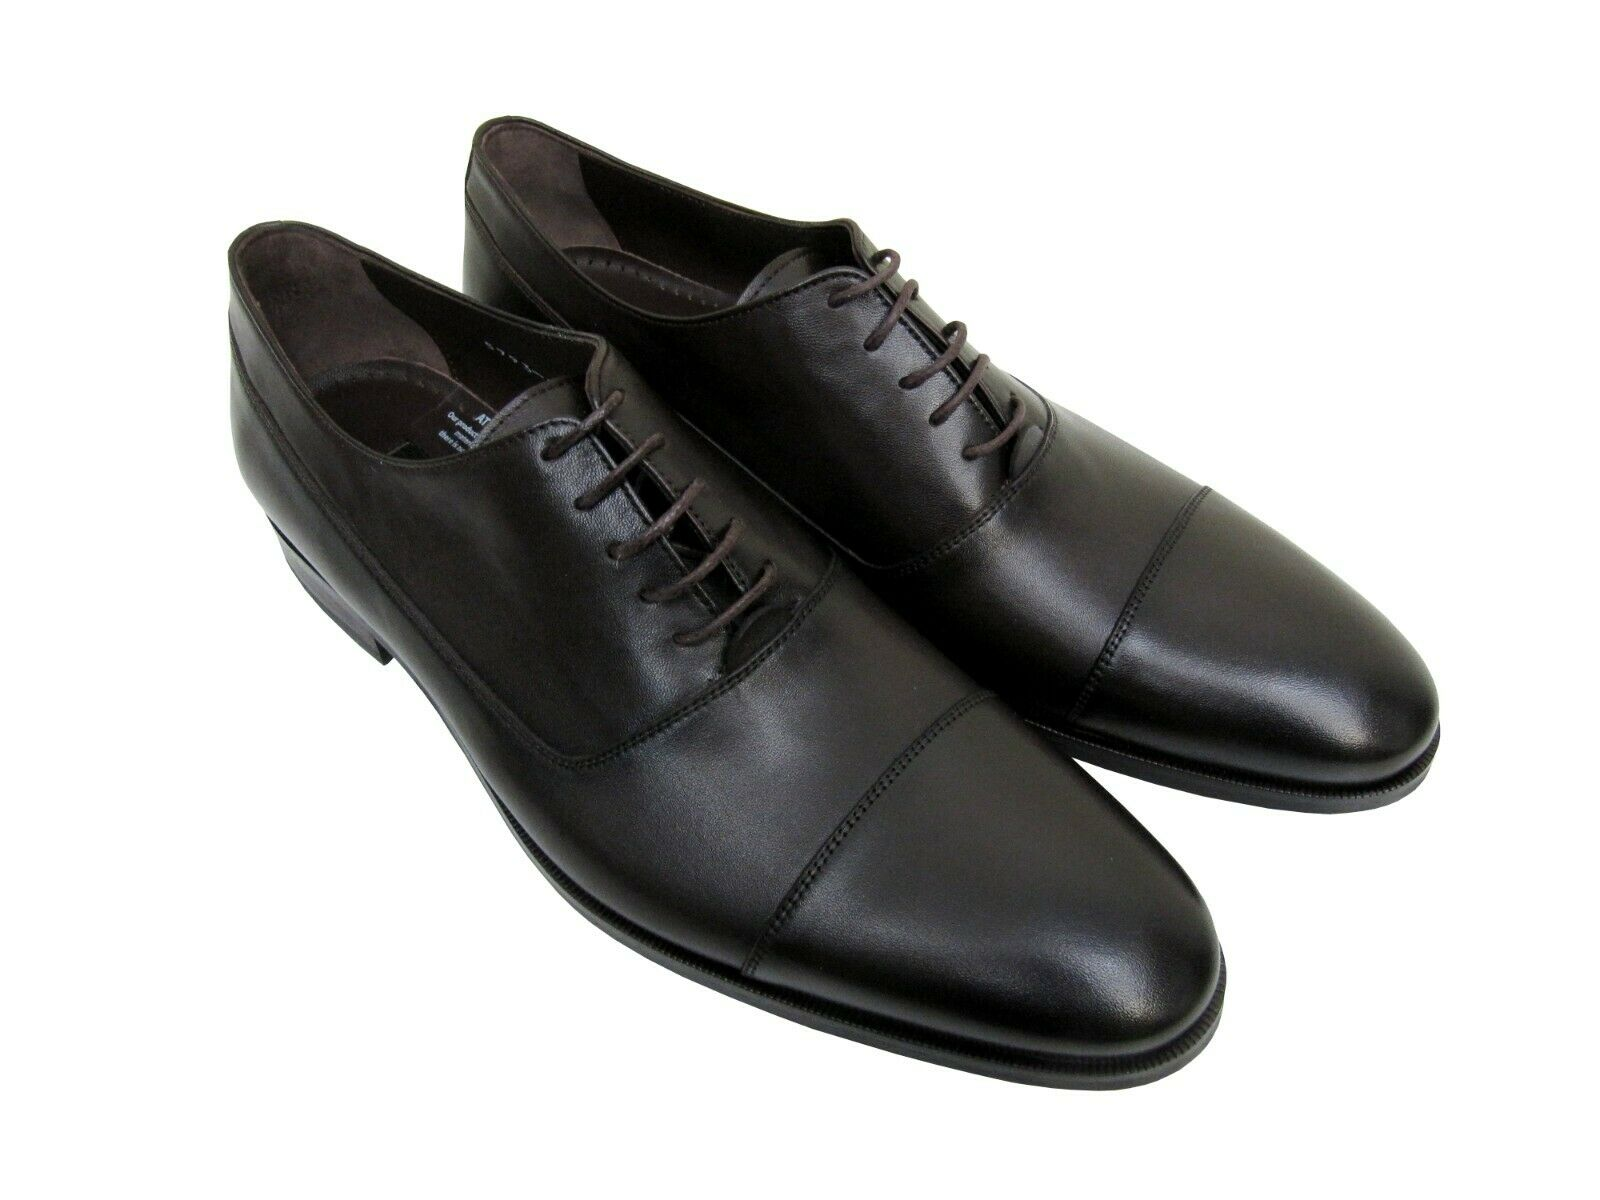 Herren leder Schuhe Business Freizeit Gr.41 Dunkelbraun